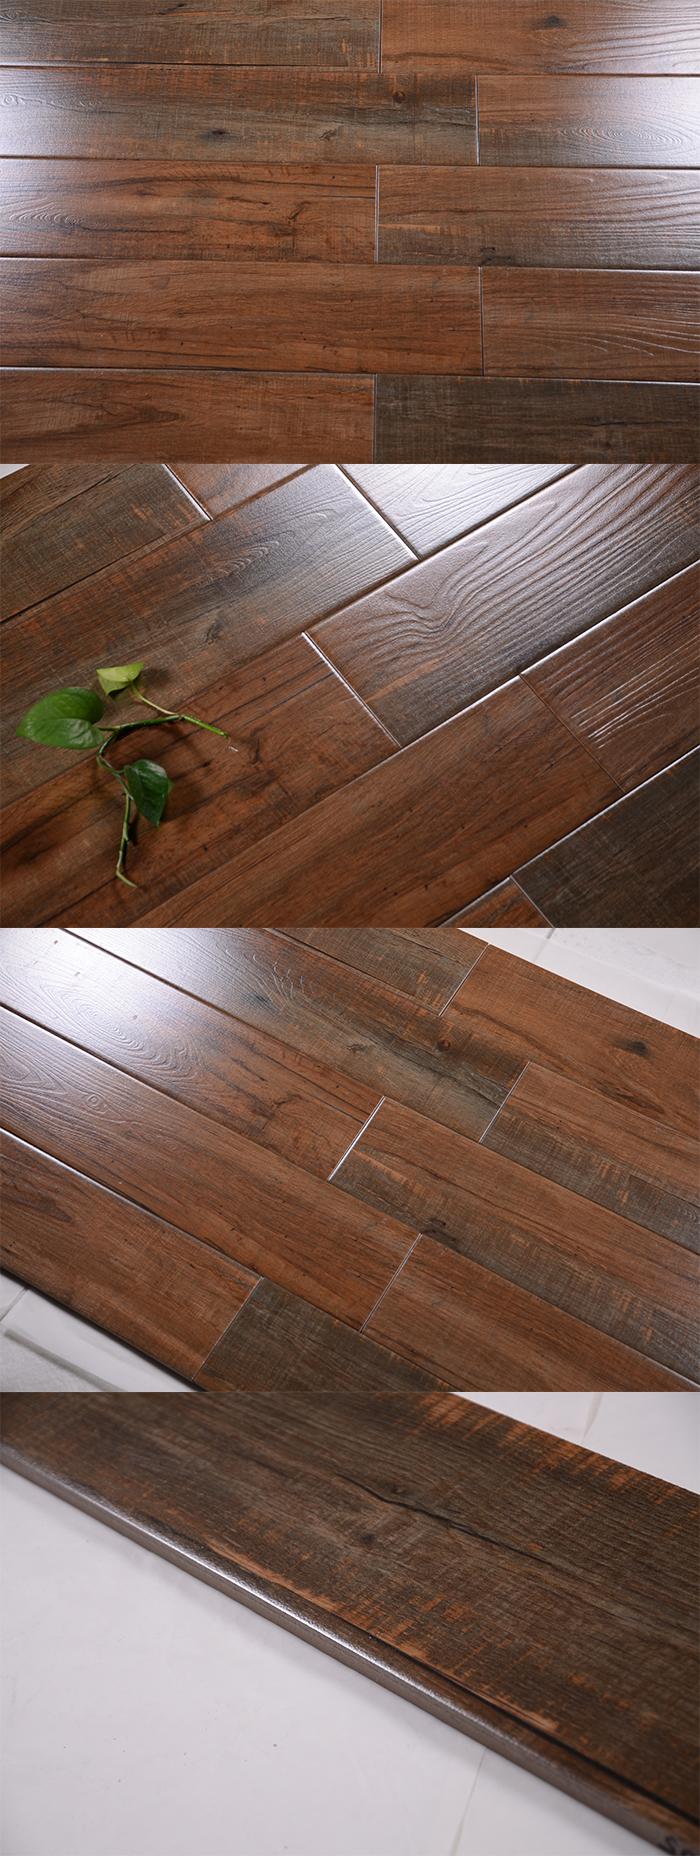 Hyj15607m porcelain wood texture tile flooringteak wood floor hyj15607m porcelain wood texture tile flooring teak wood floor tile dailygadgetfo Image collections